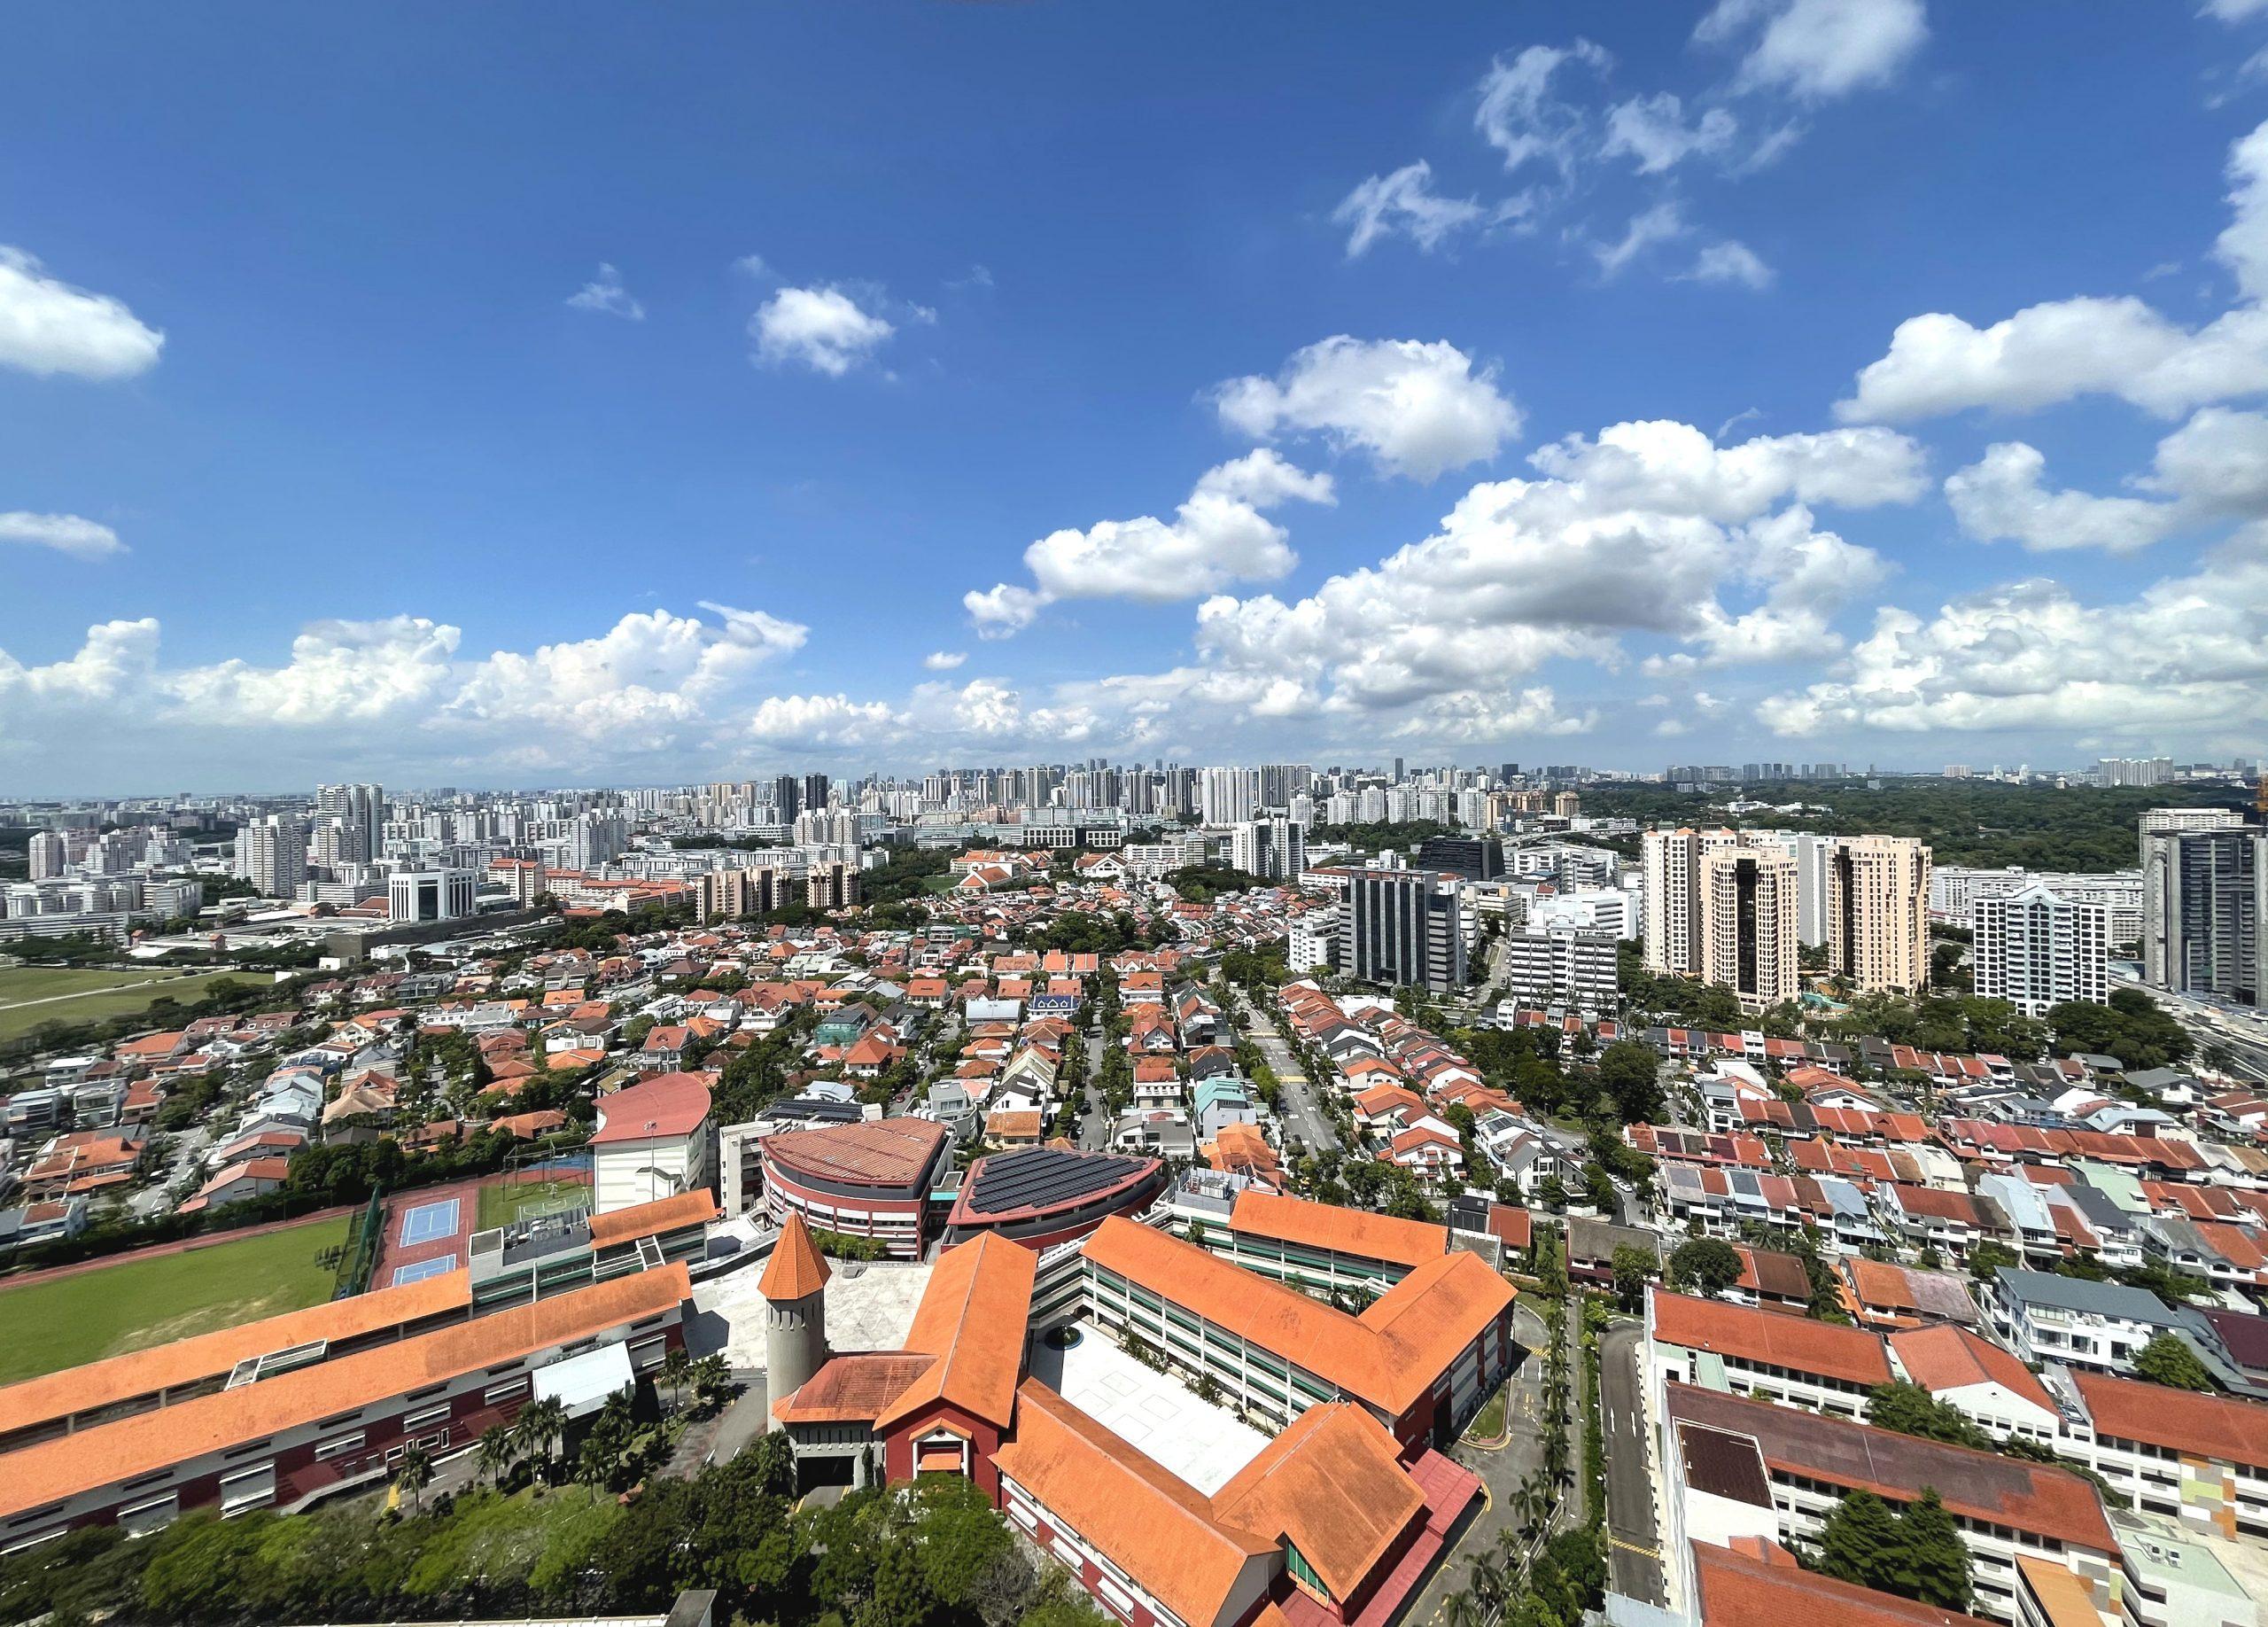 View of Natura Loft flat